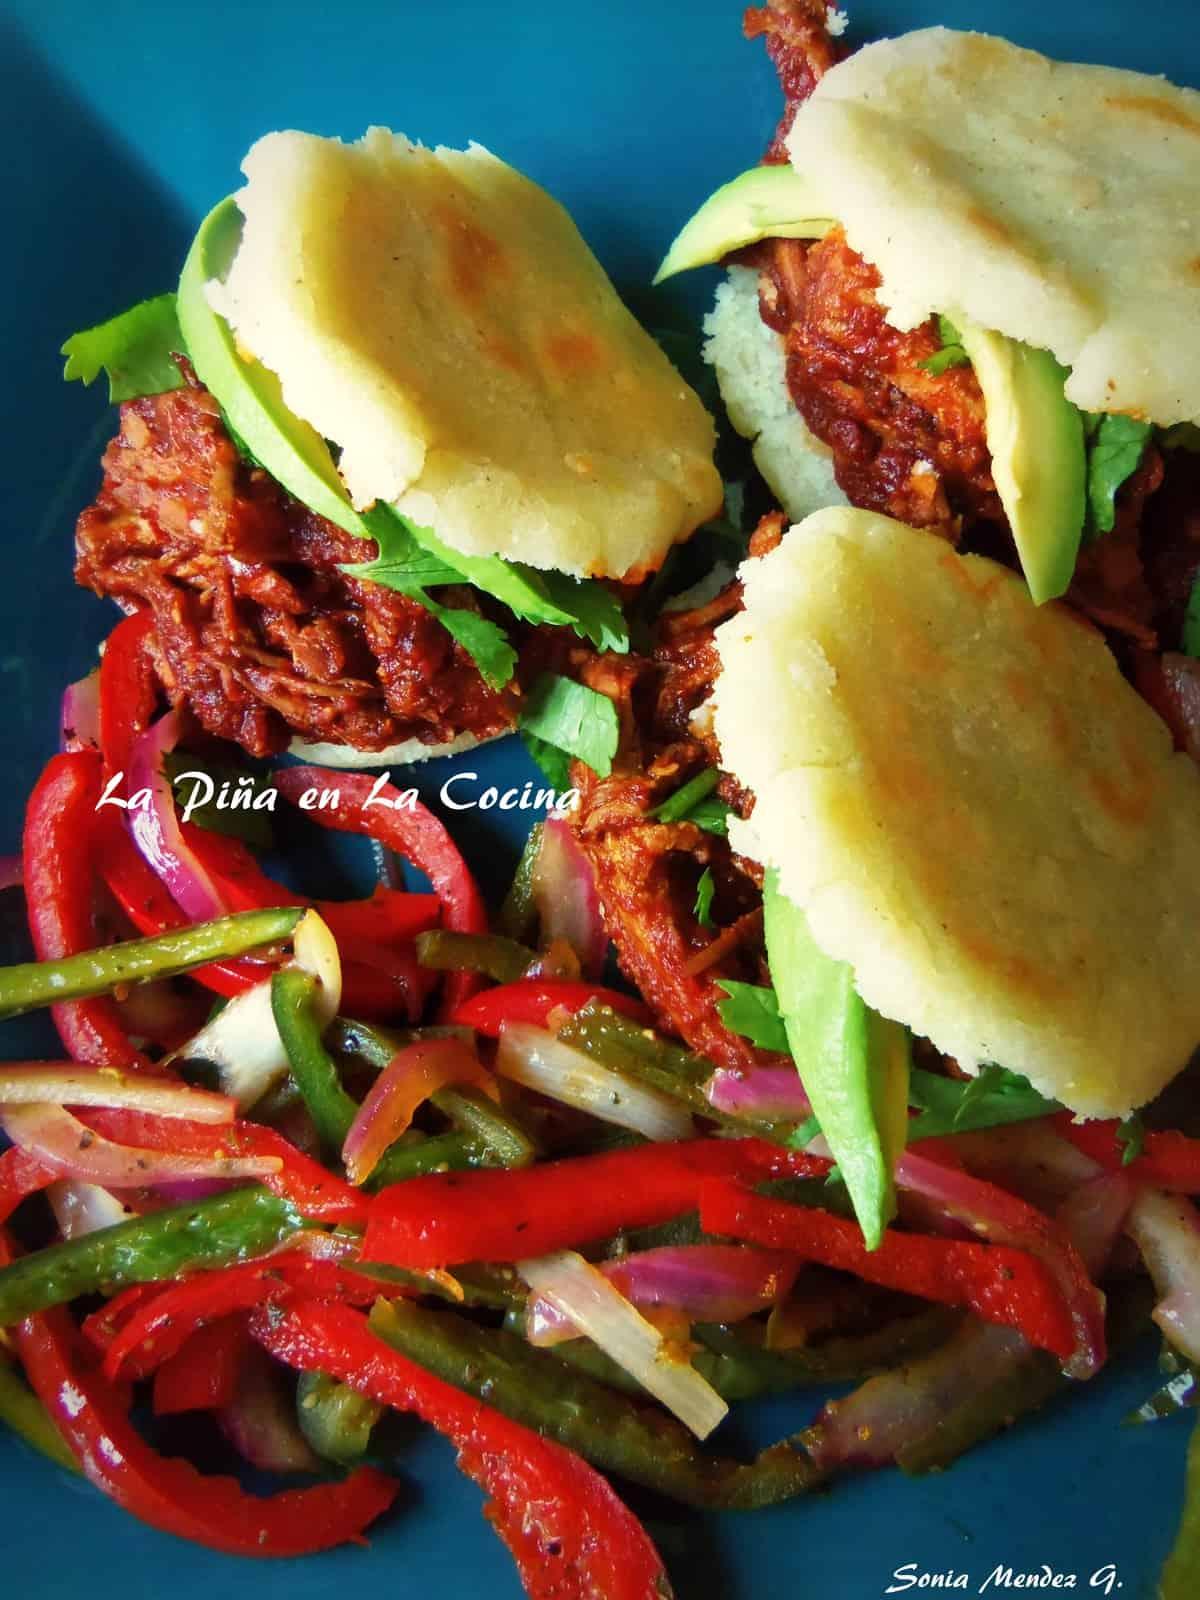 Adobo Chicken Arepas